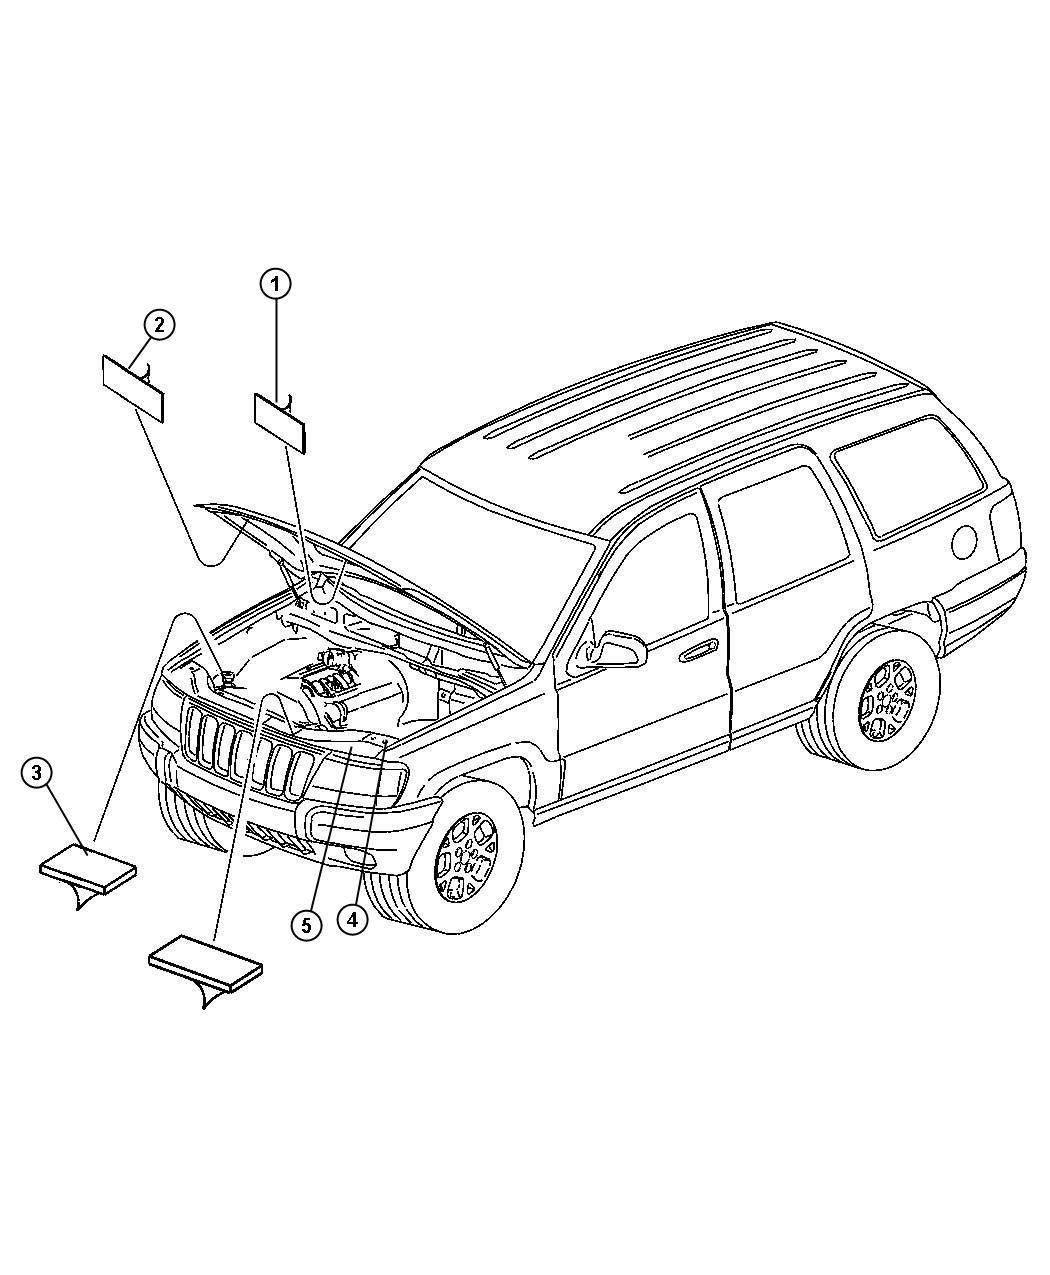 Jeep Commander Battery Export Japan Wet Maintenance